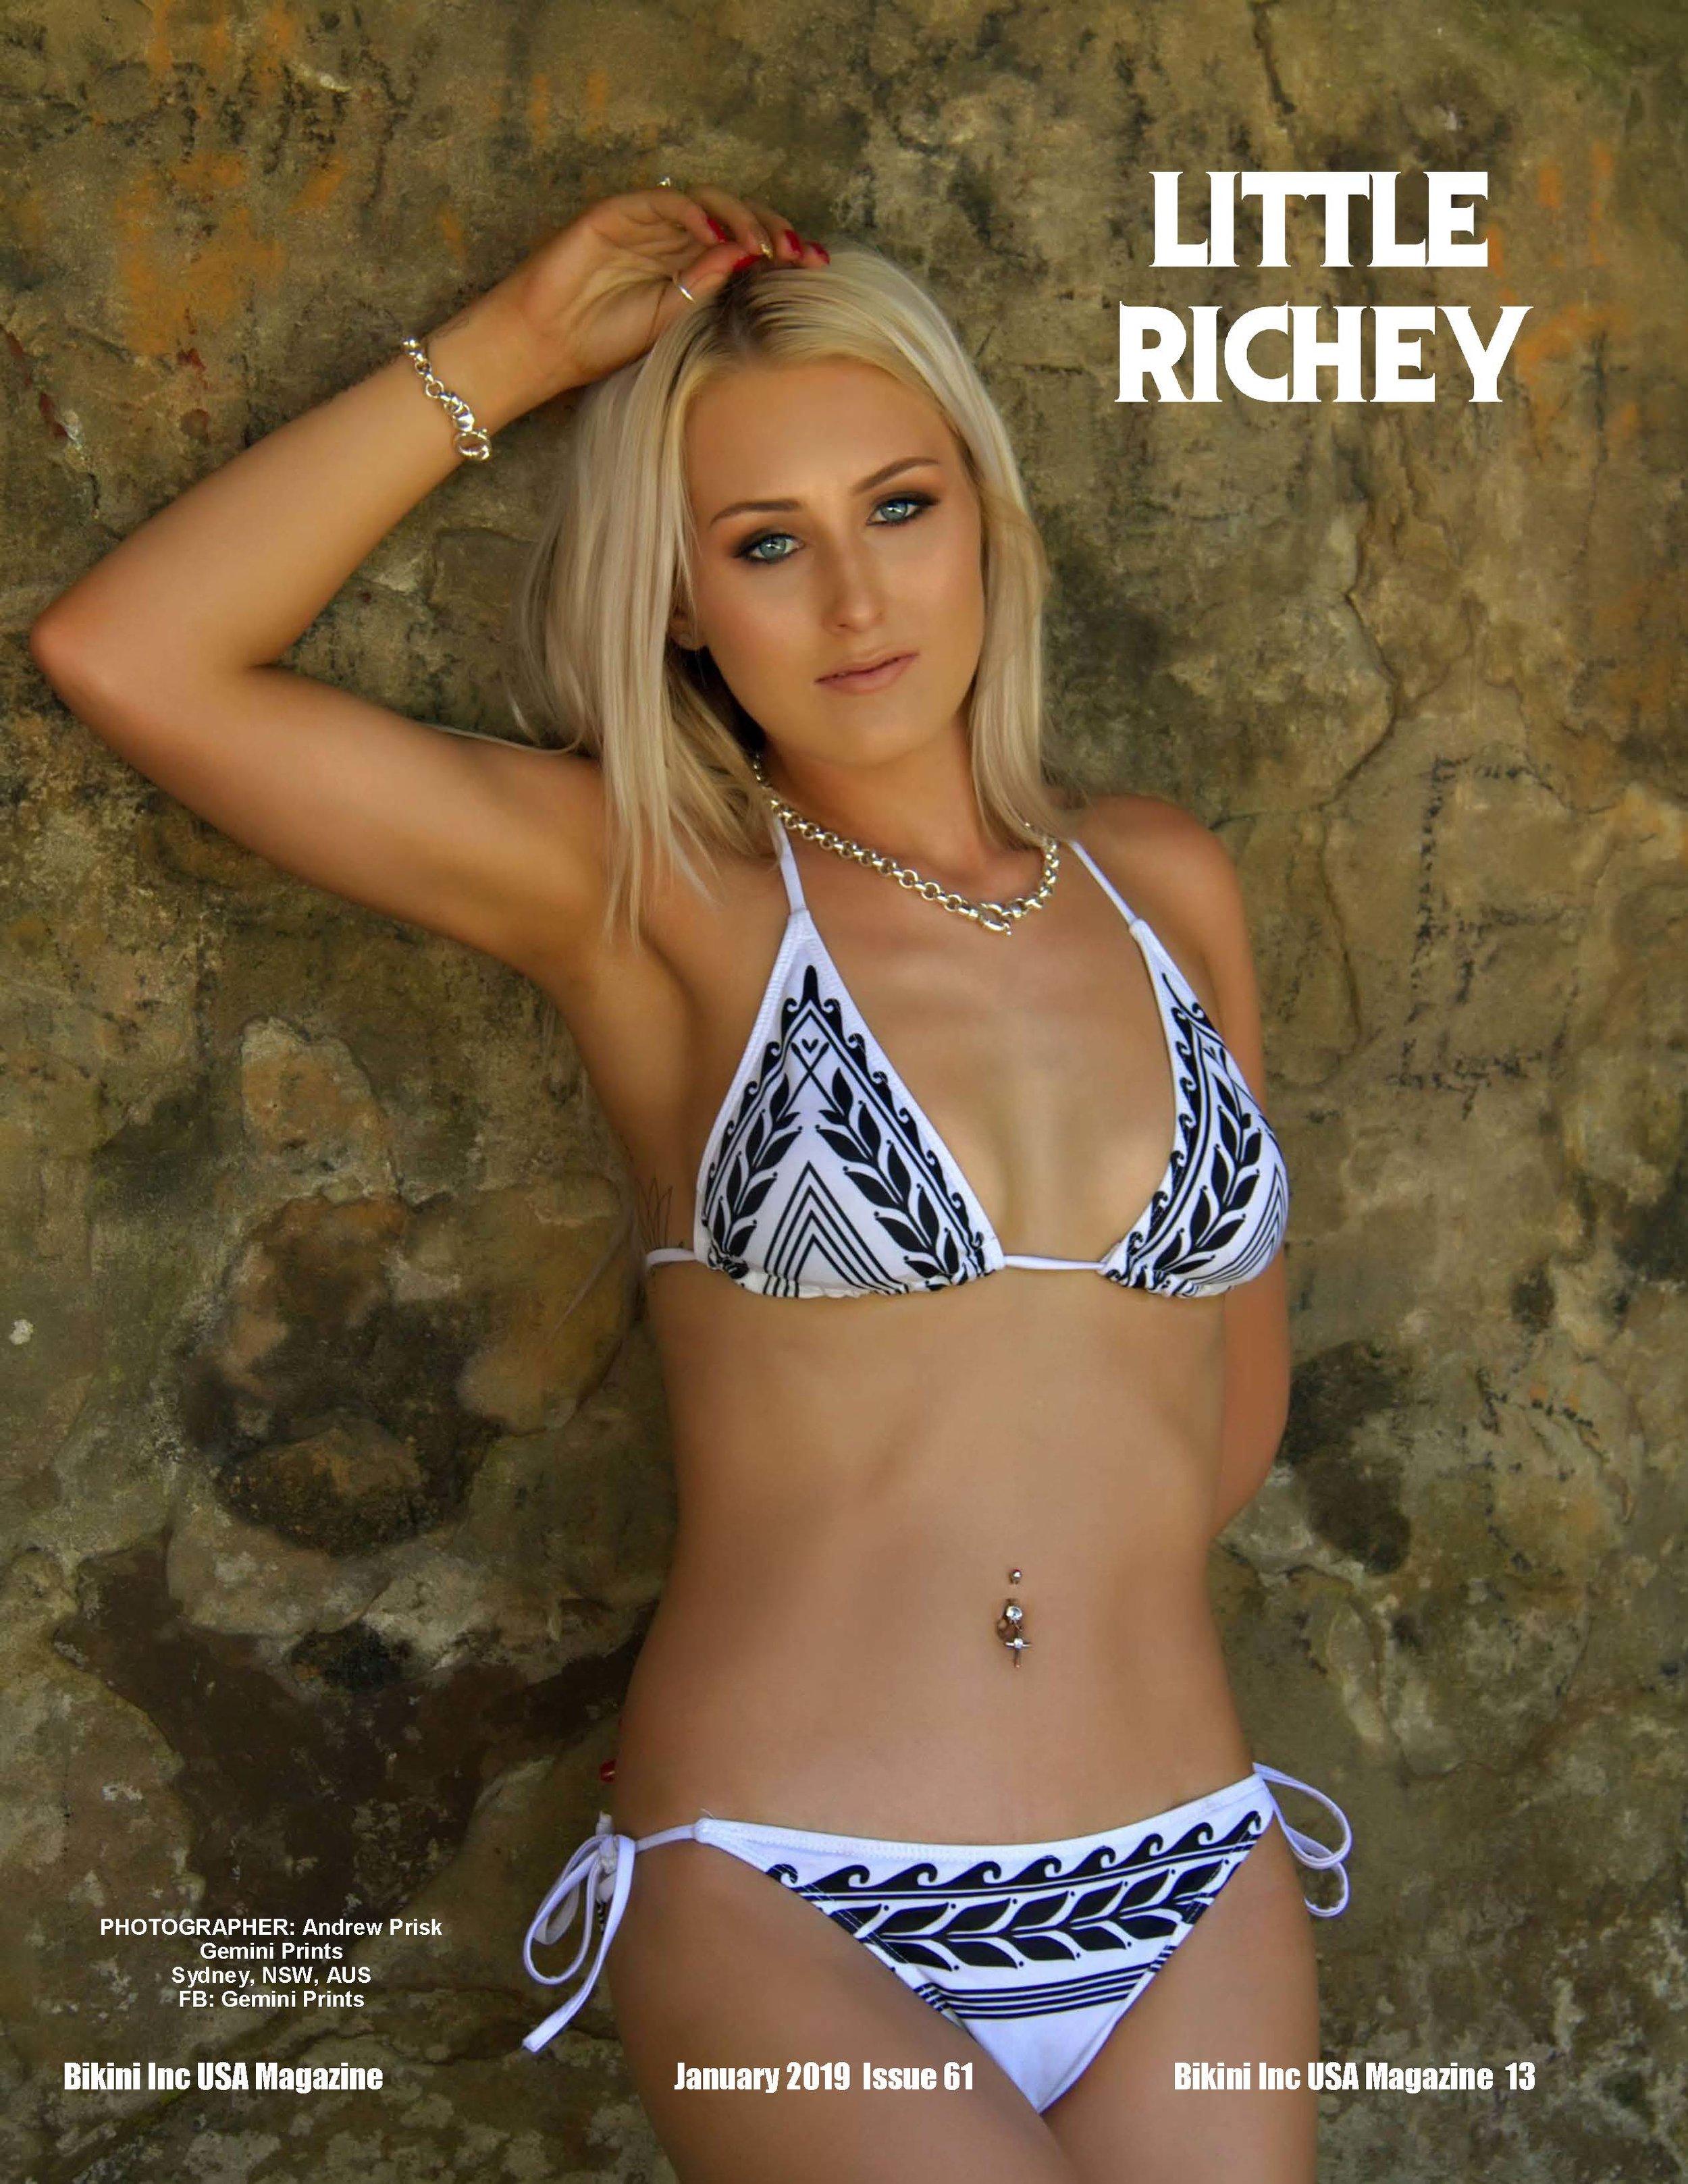 Little Richey - Jan 2019